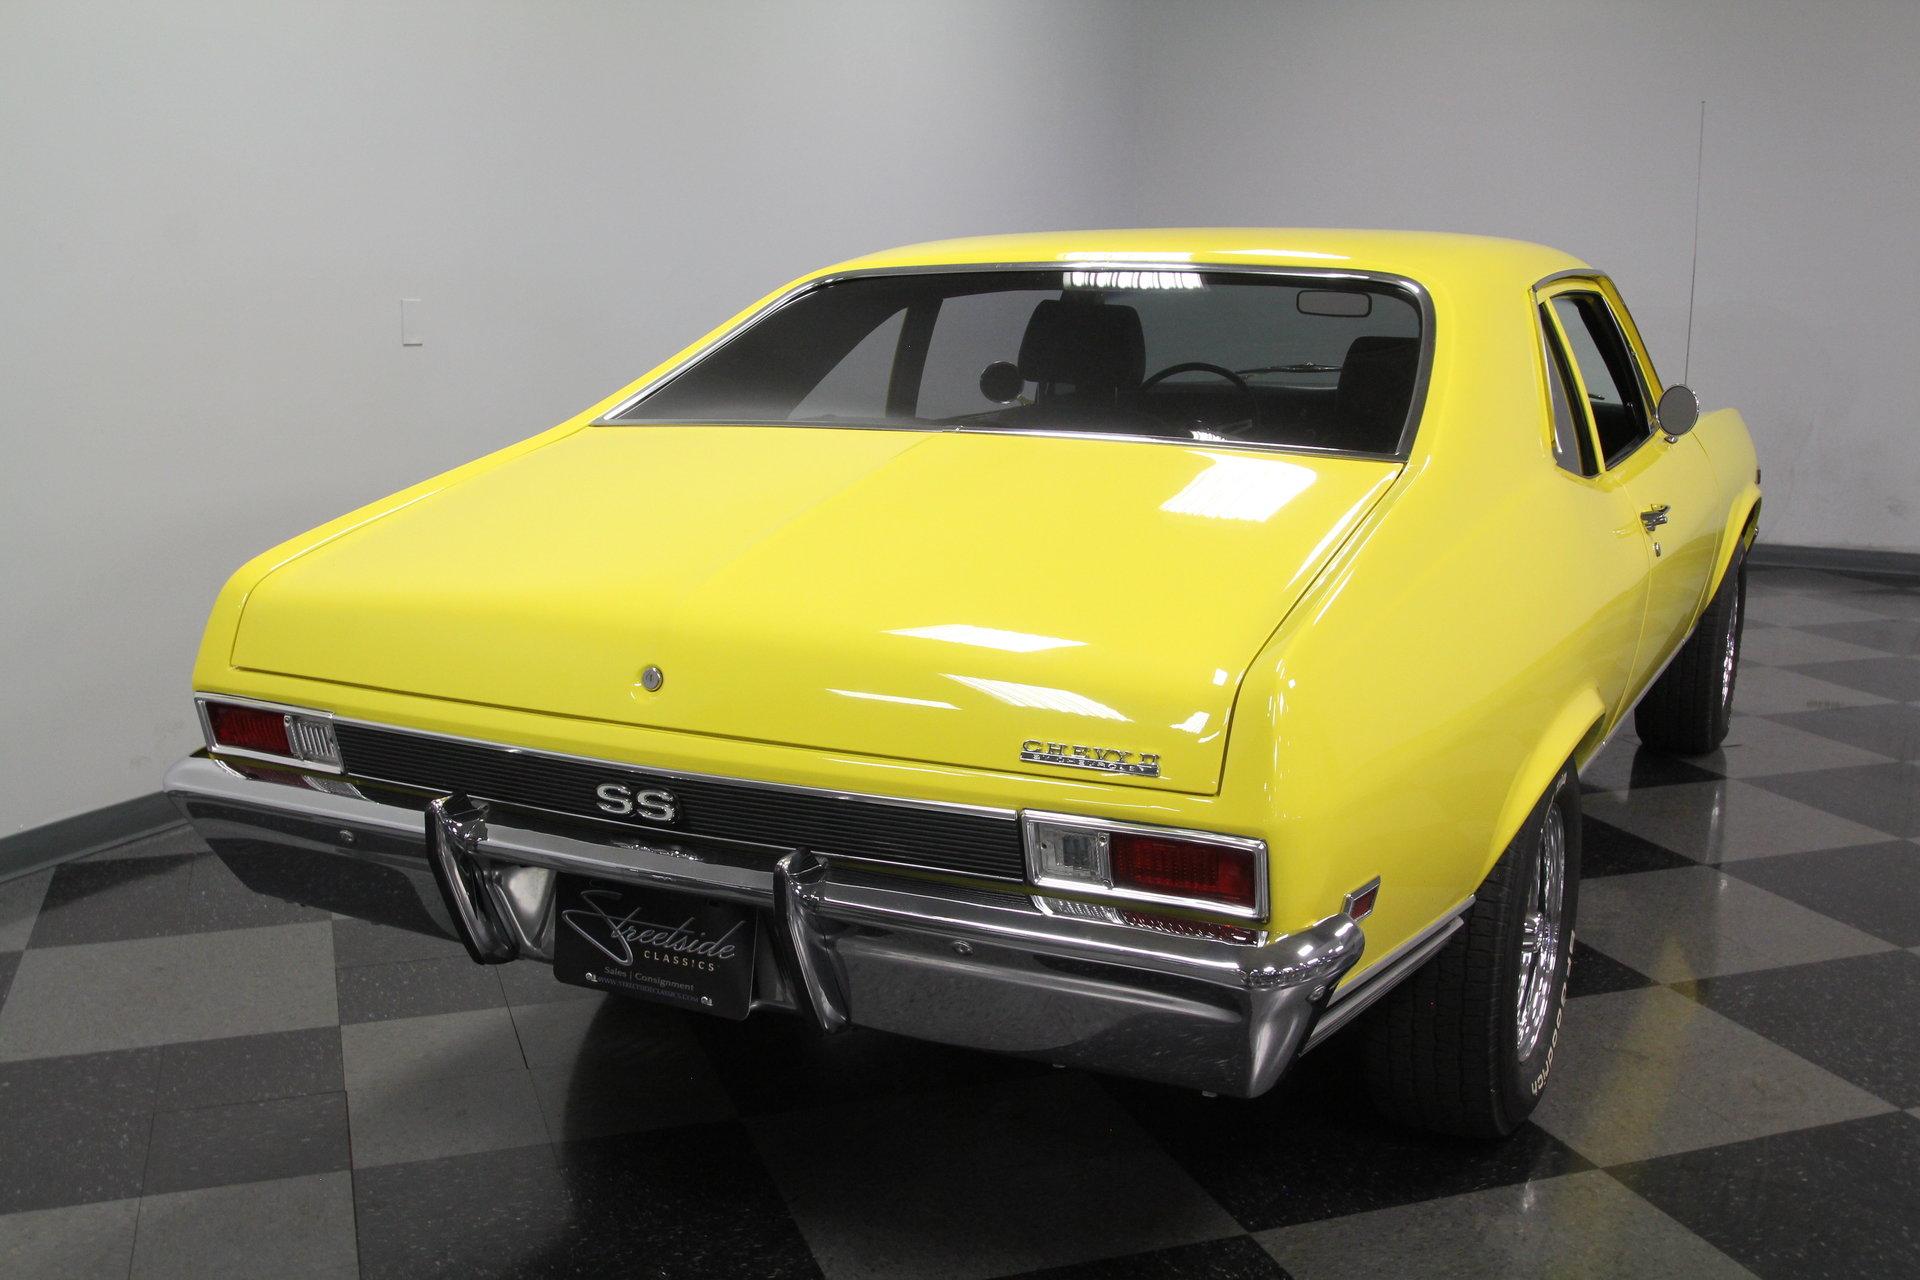 1968 Chevrolet Nova Streetside Classics The Nations Trusted Chevy Ss Show More Photos